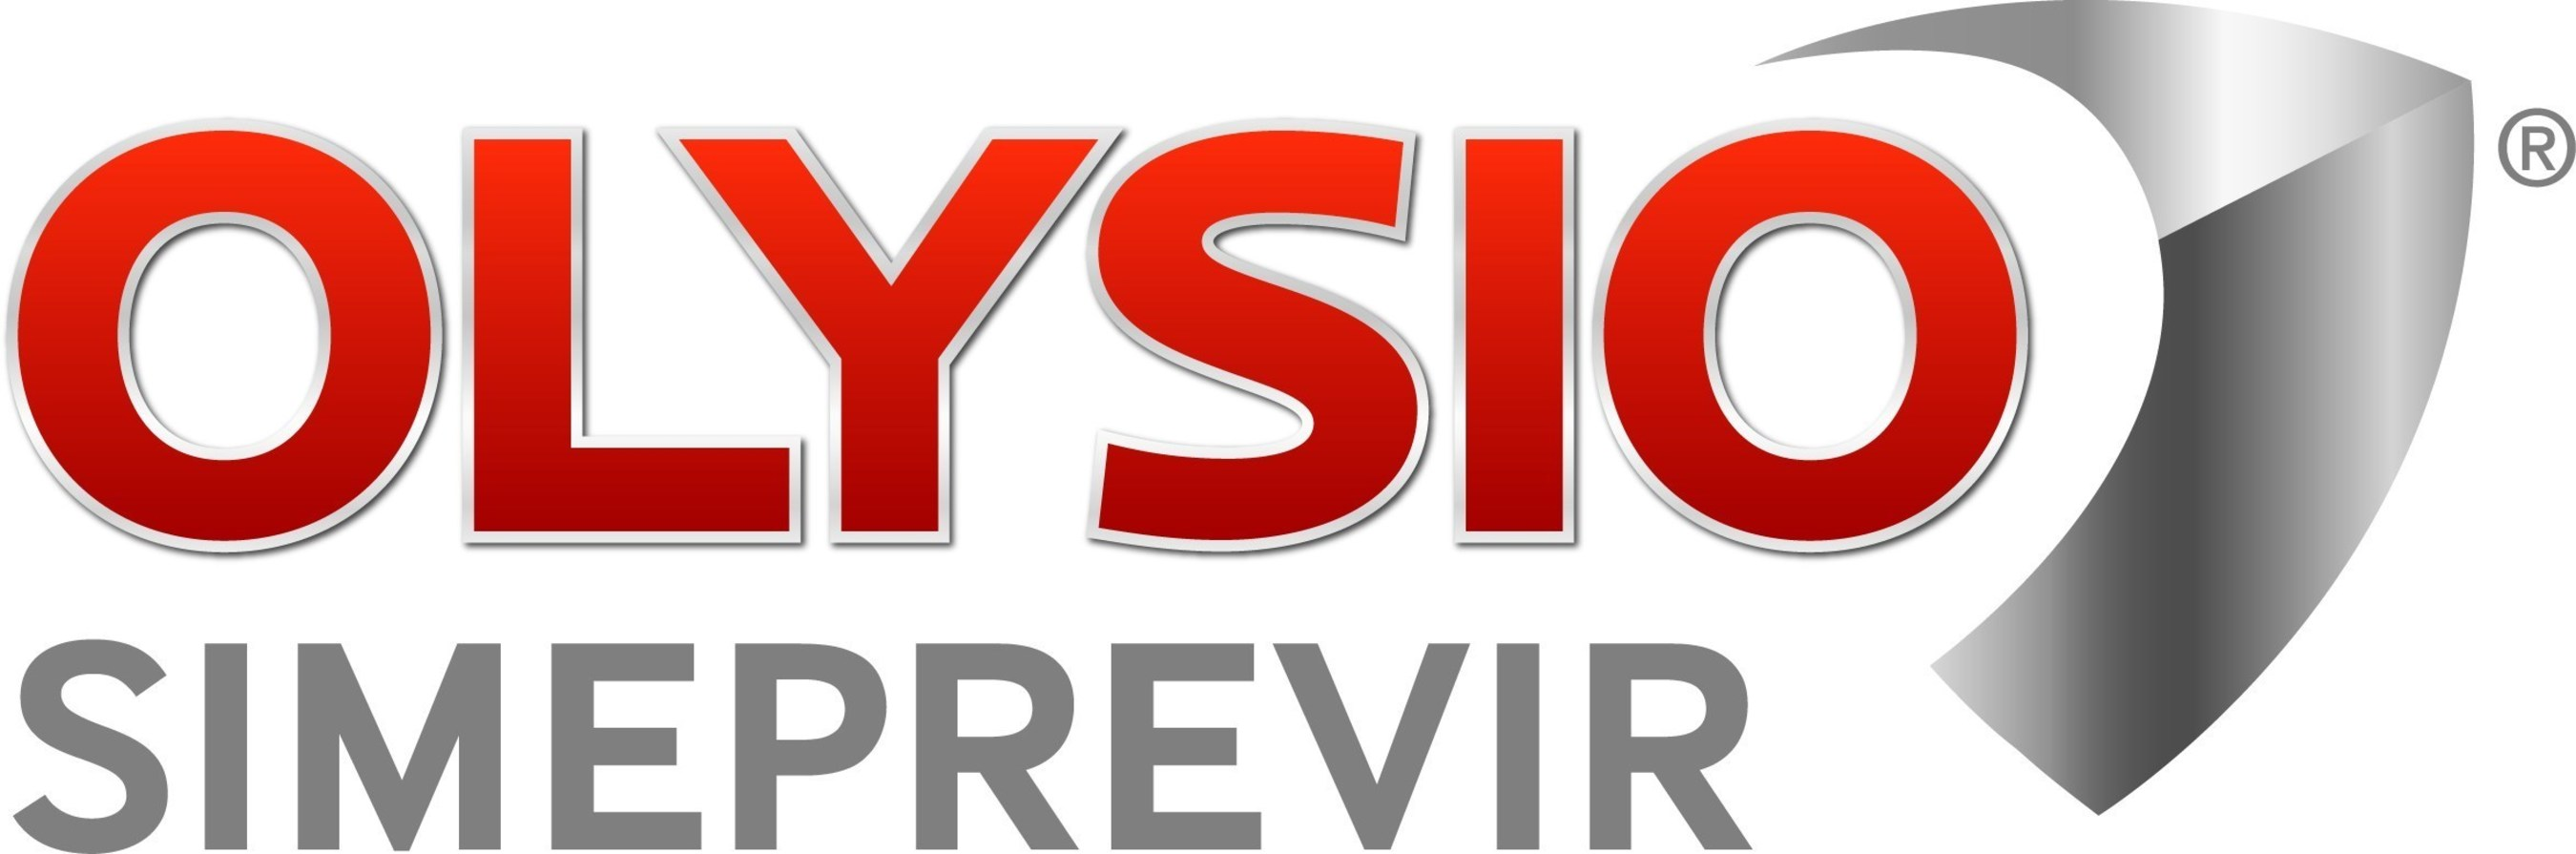 OLYSIO(R) (simeprevir) Logo